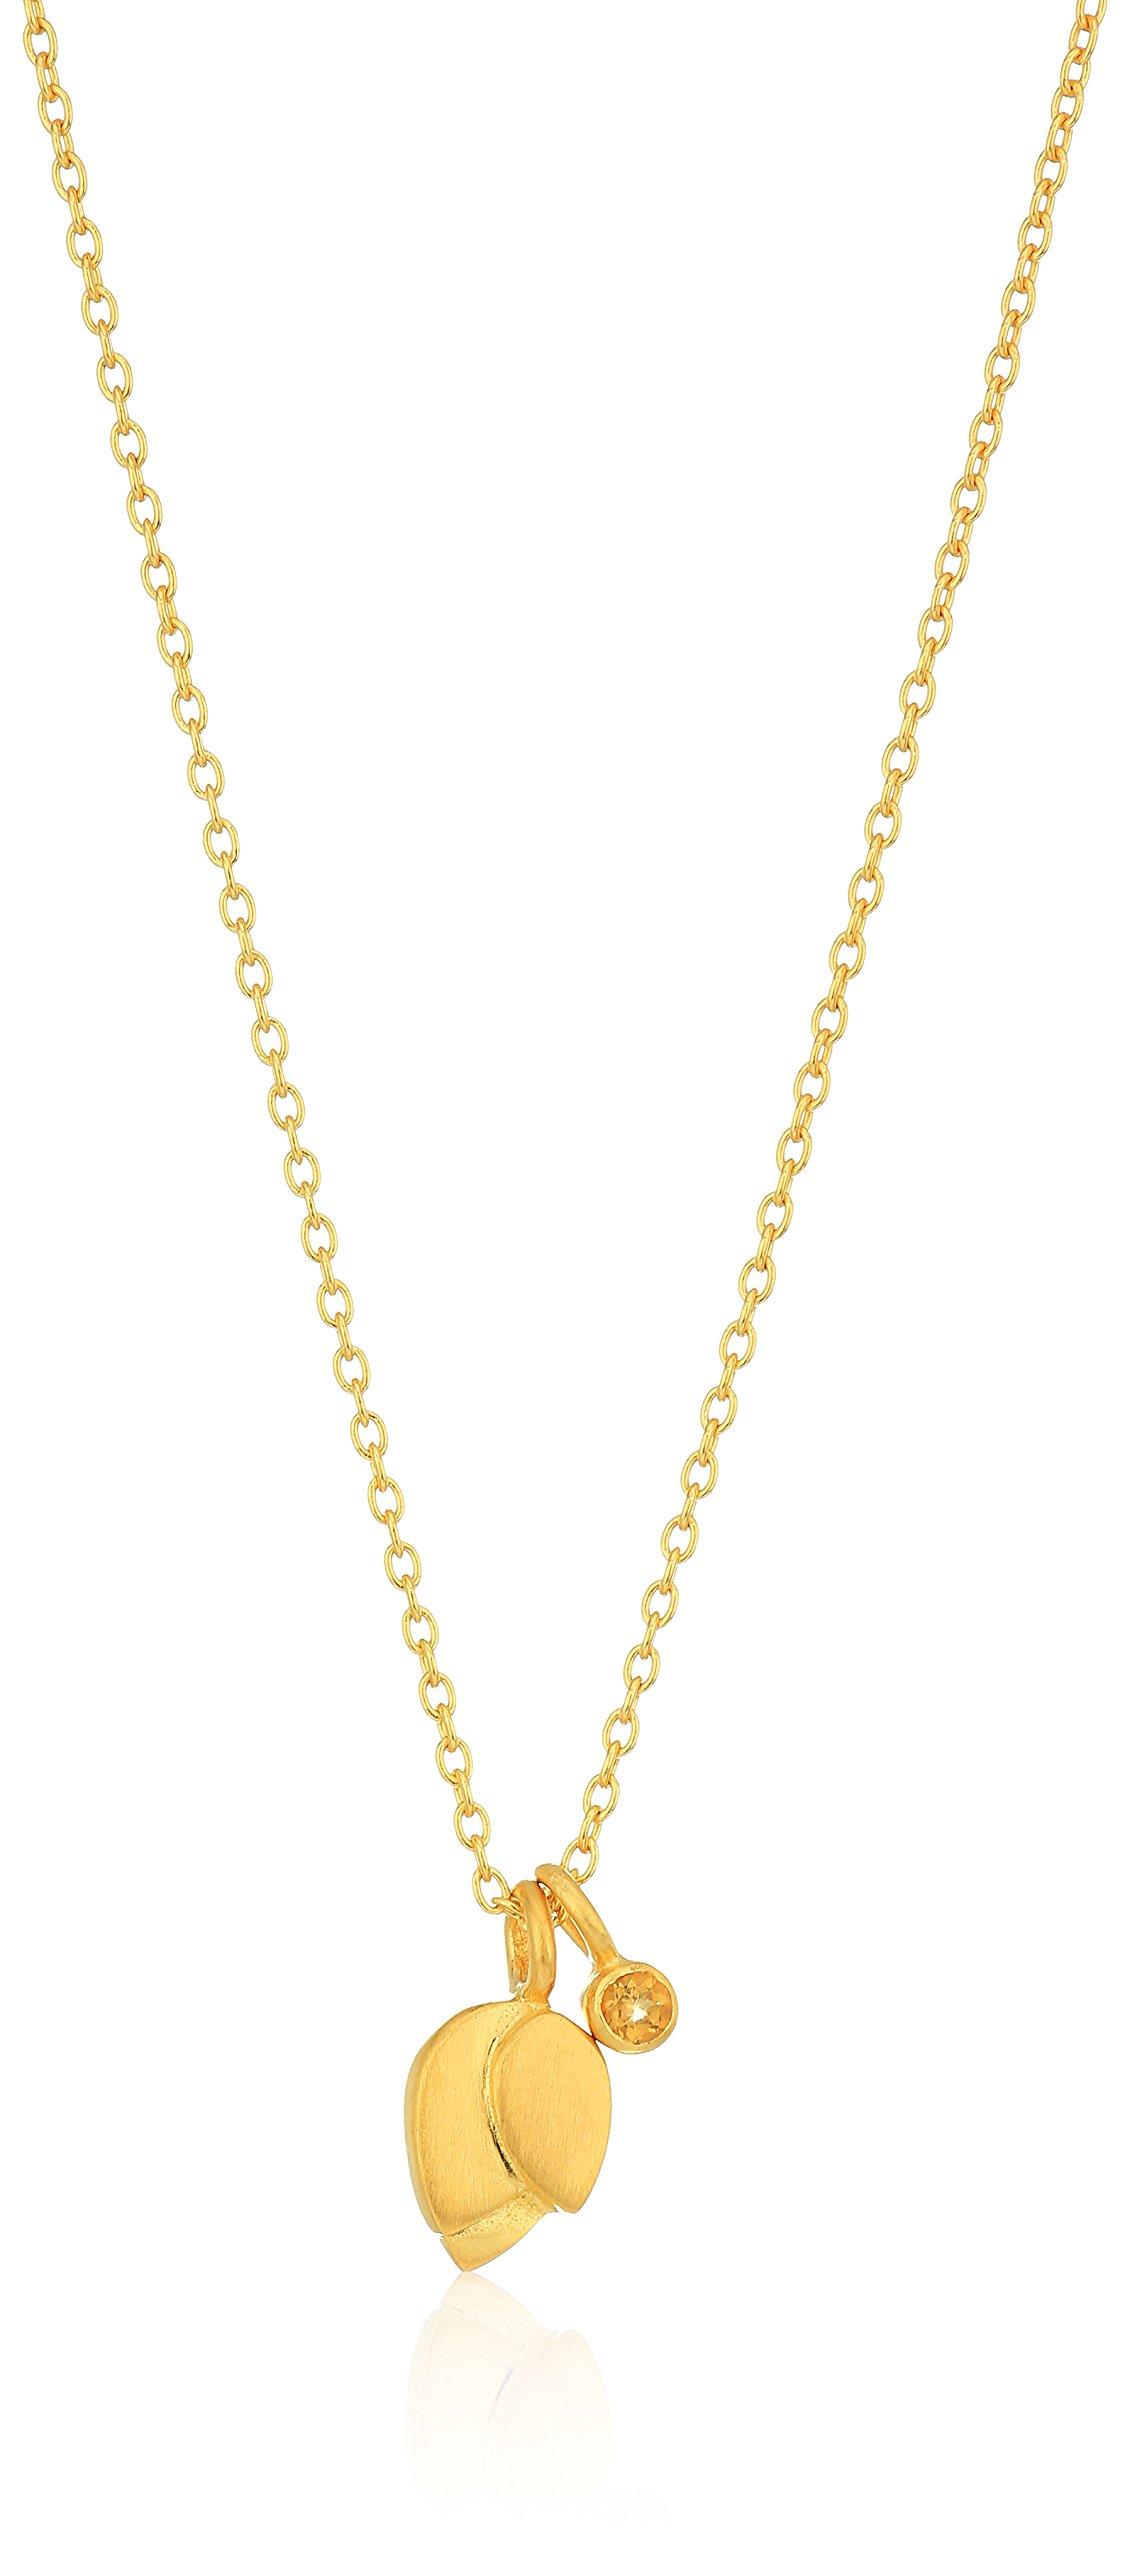 Satya Jewelry Citrine Gold Plate Lotus Petal Birthstone Pendant Necklace, 18-Inch, Yellow